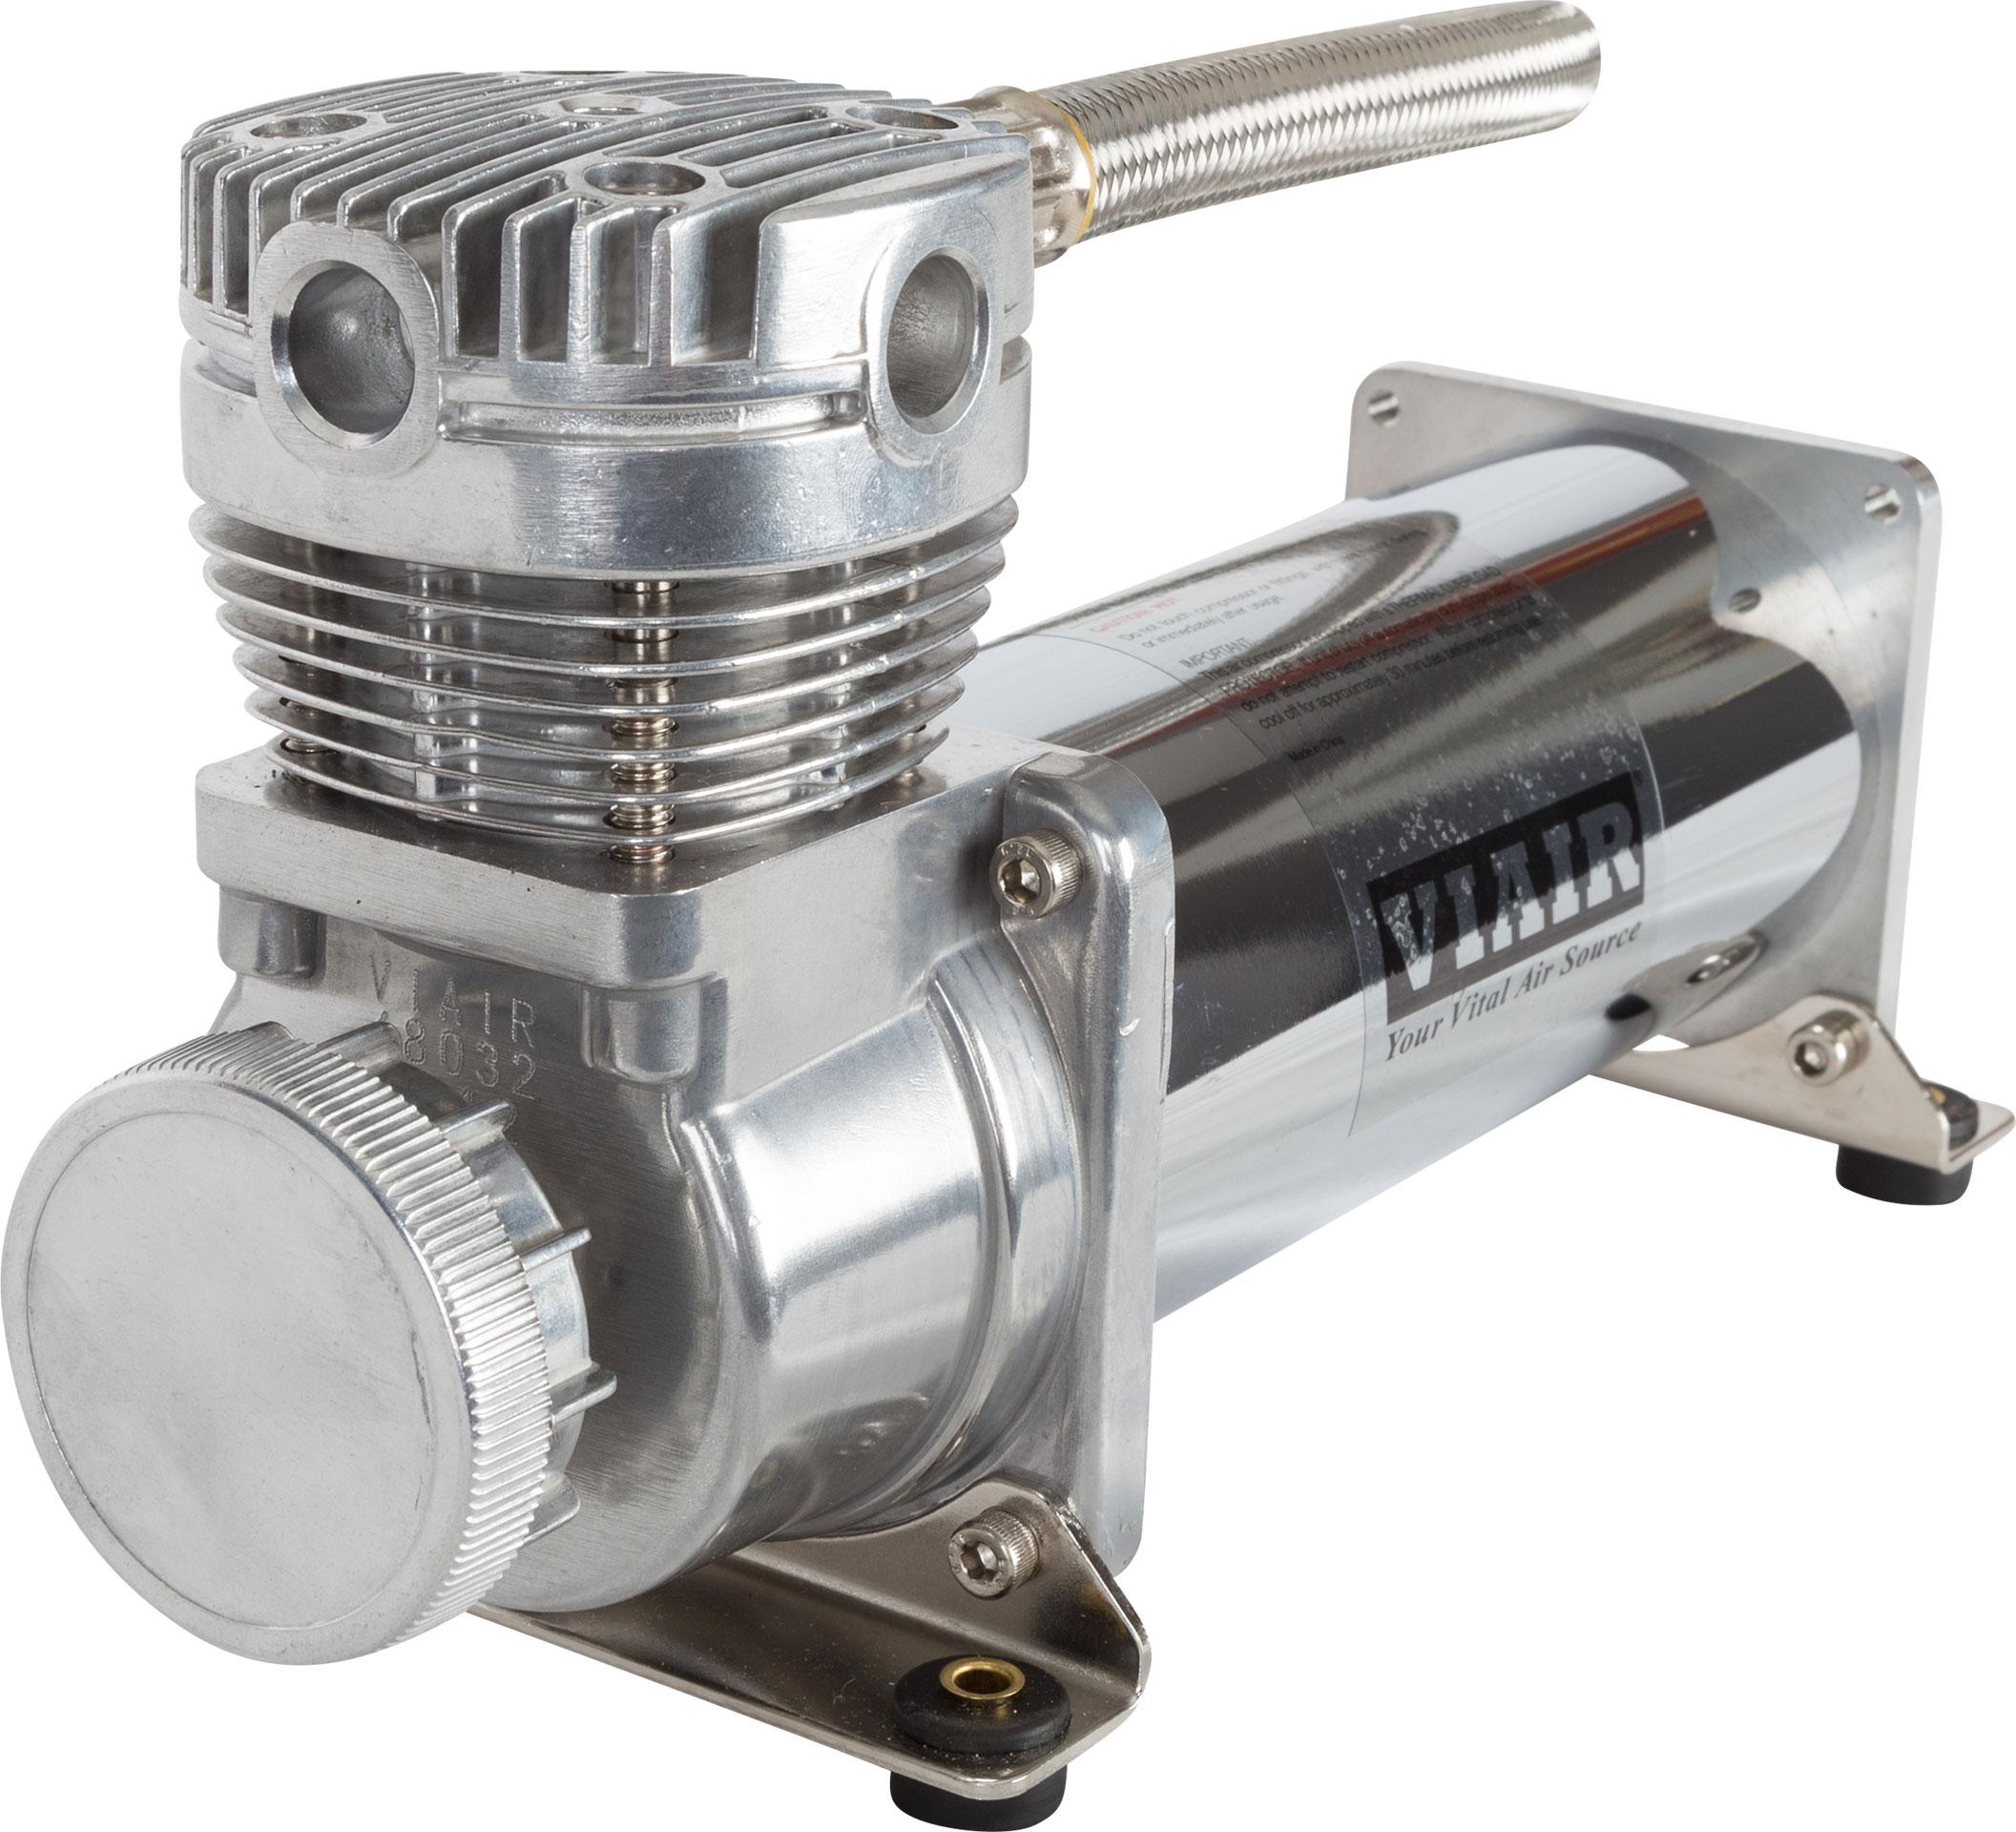 viair air compressor wiring diagram wiring diagrams and schematics viair  wiring diagramair horn diagram viair light